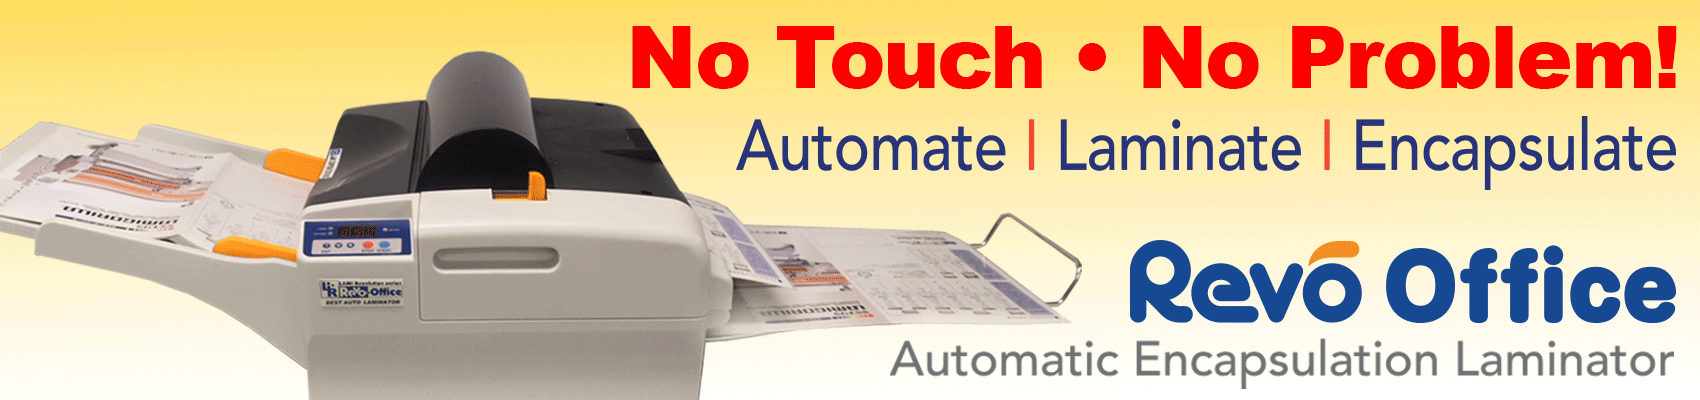 Revo Office Automatic Encapsulation Laminator